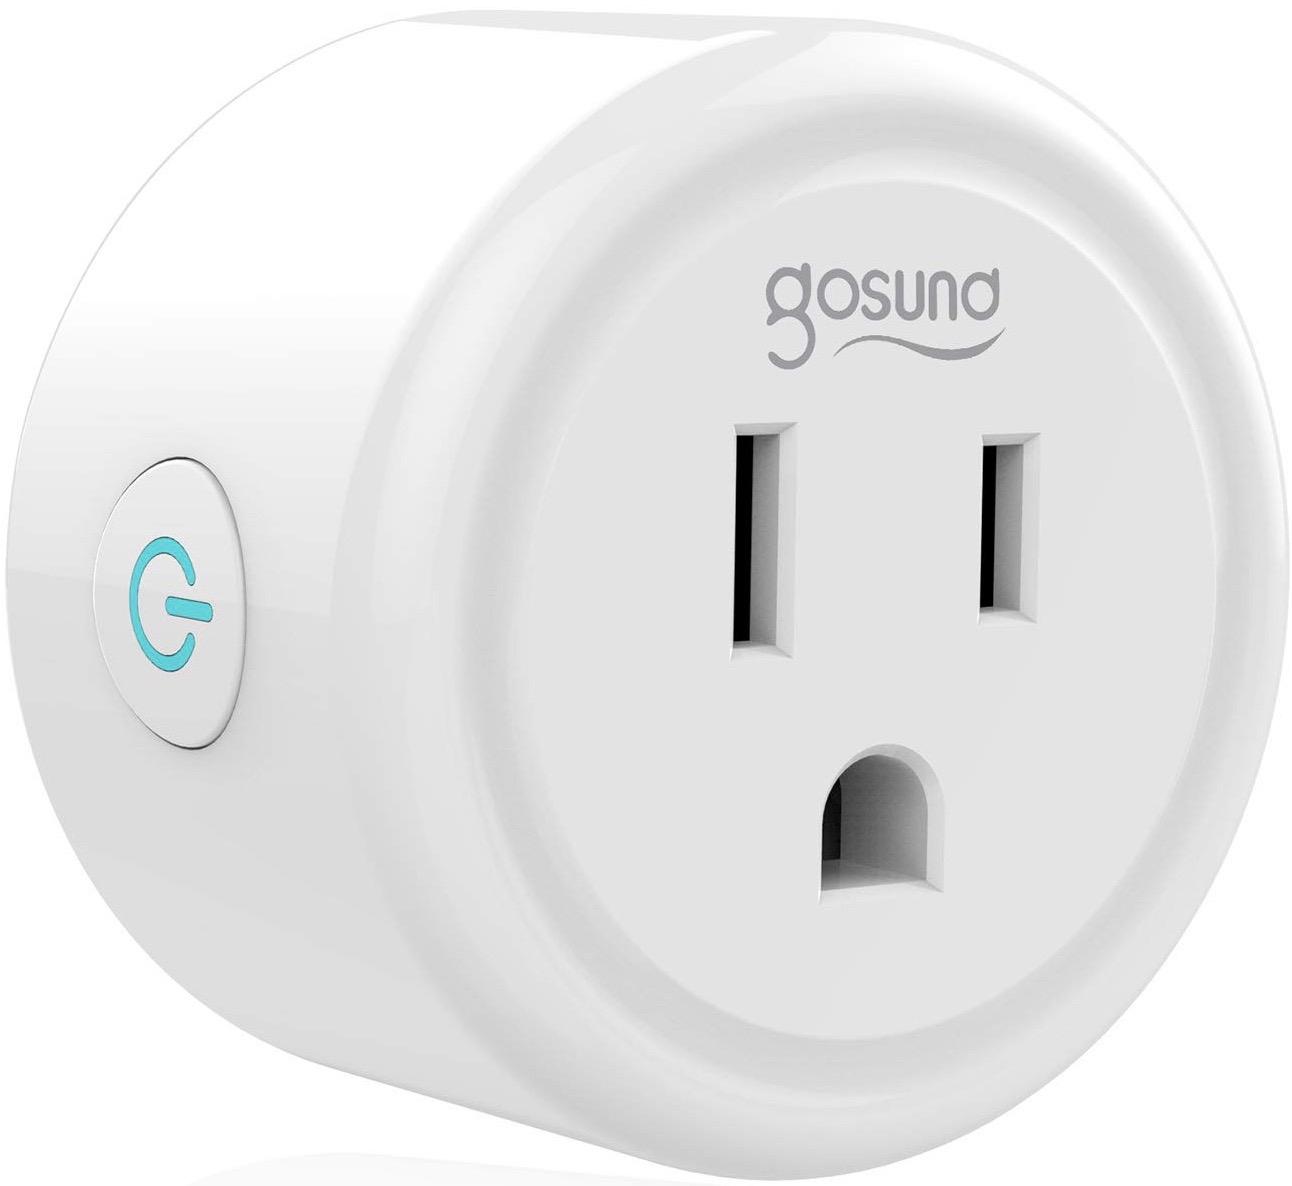 Gosund Mini Wi-Fi Smart Plug Review: Compact control